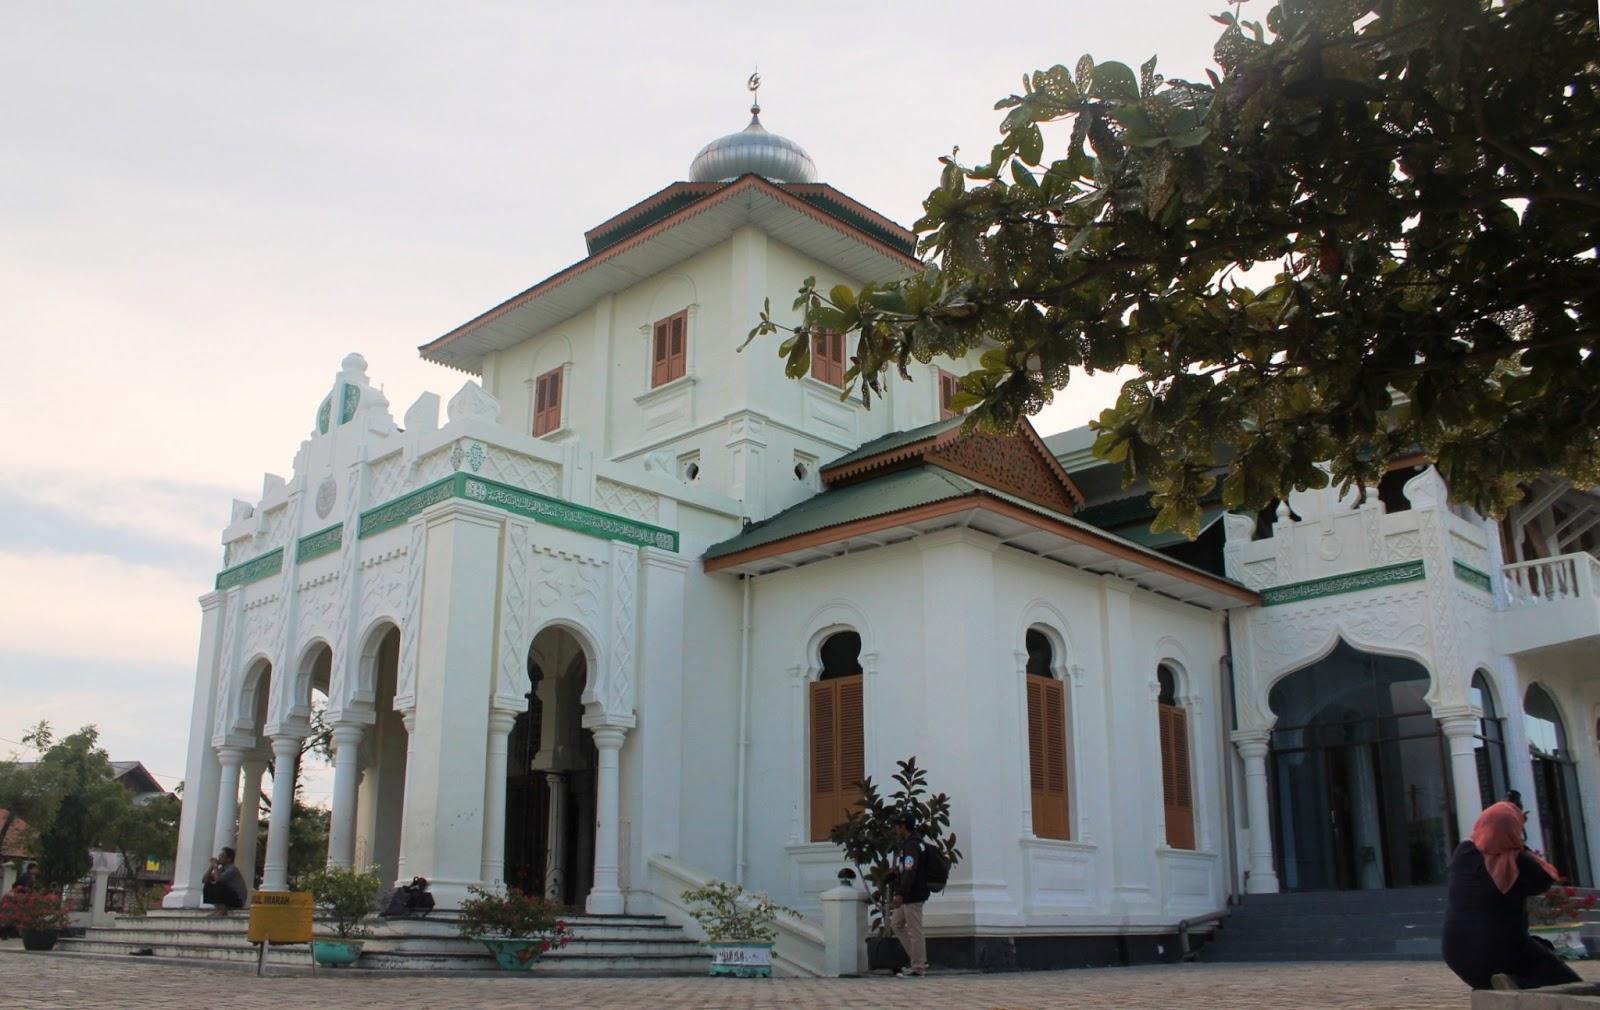 Masjid Baiturrahim Ulee Lheue Hunting Photography Architecture Time Show Kota